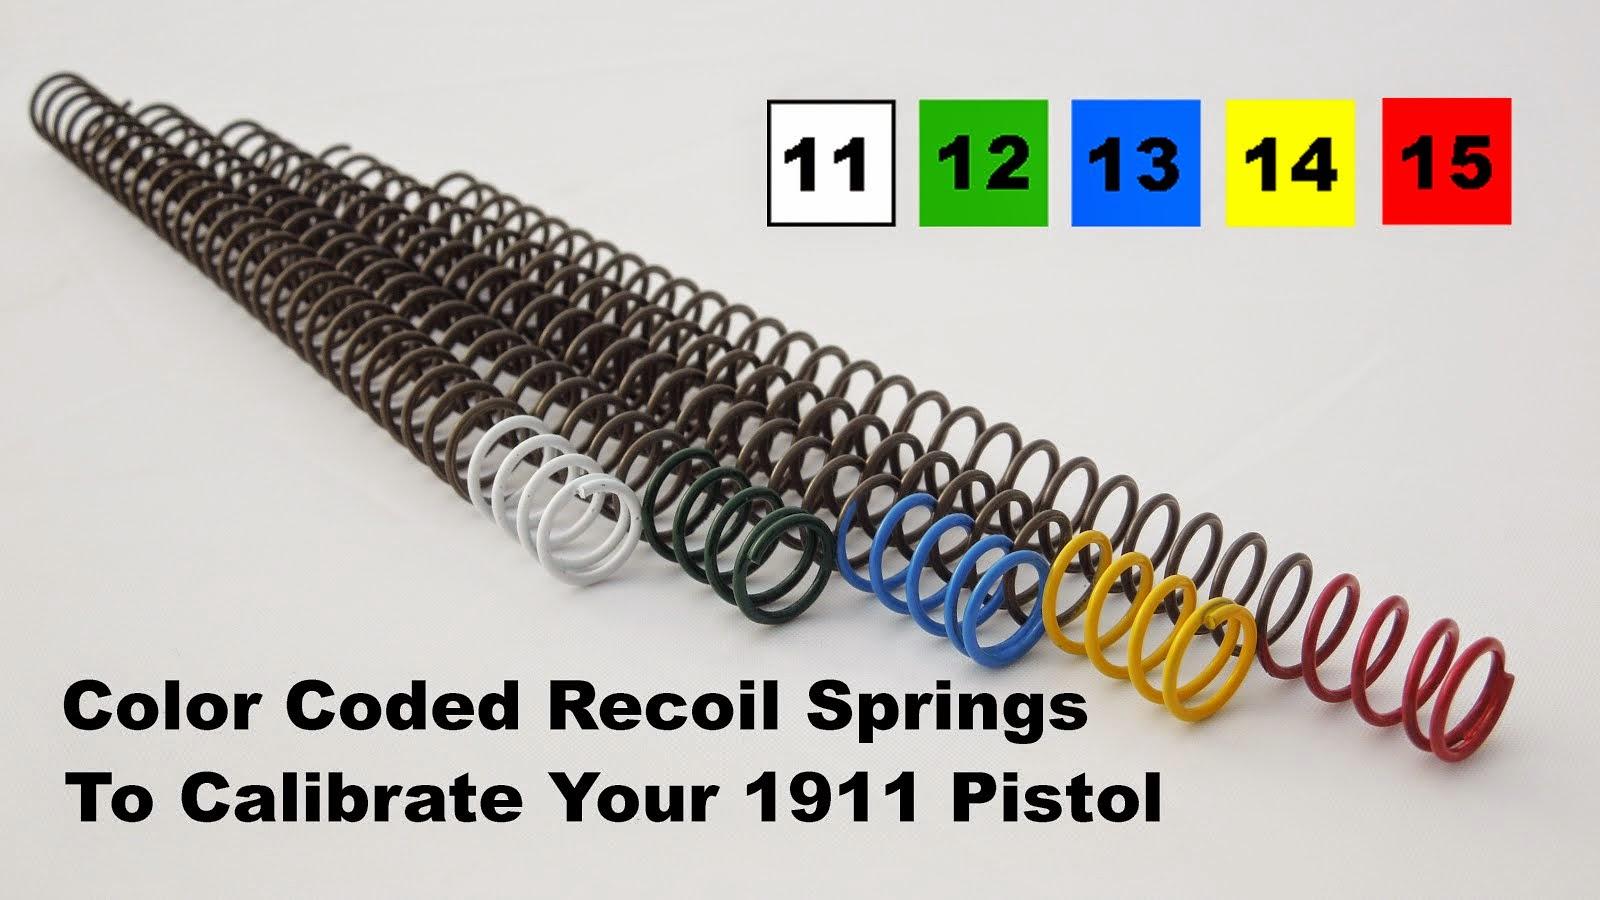 1911 Recoil Springs